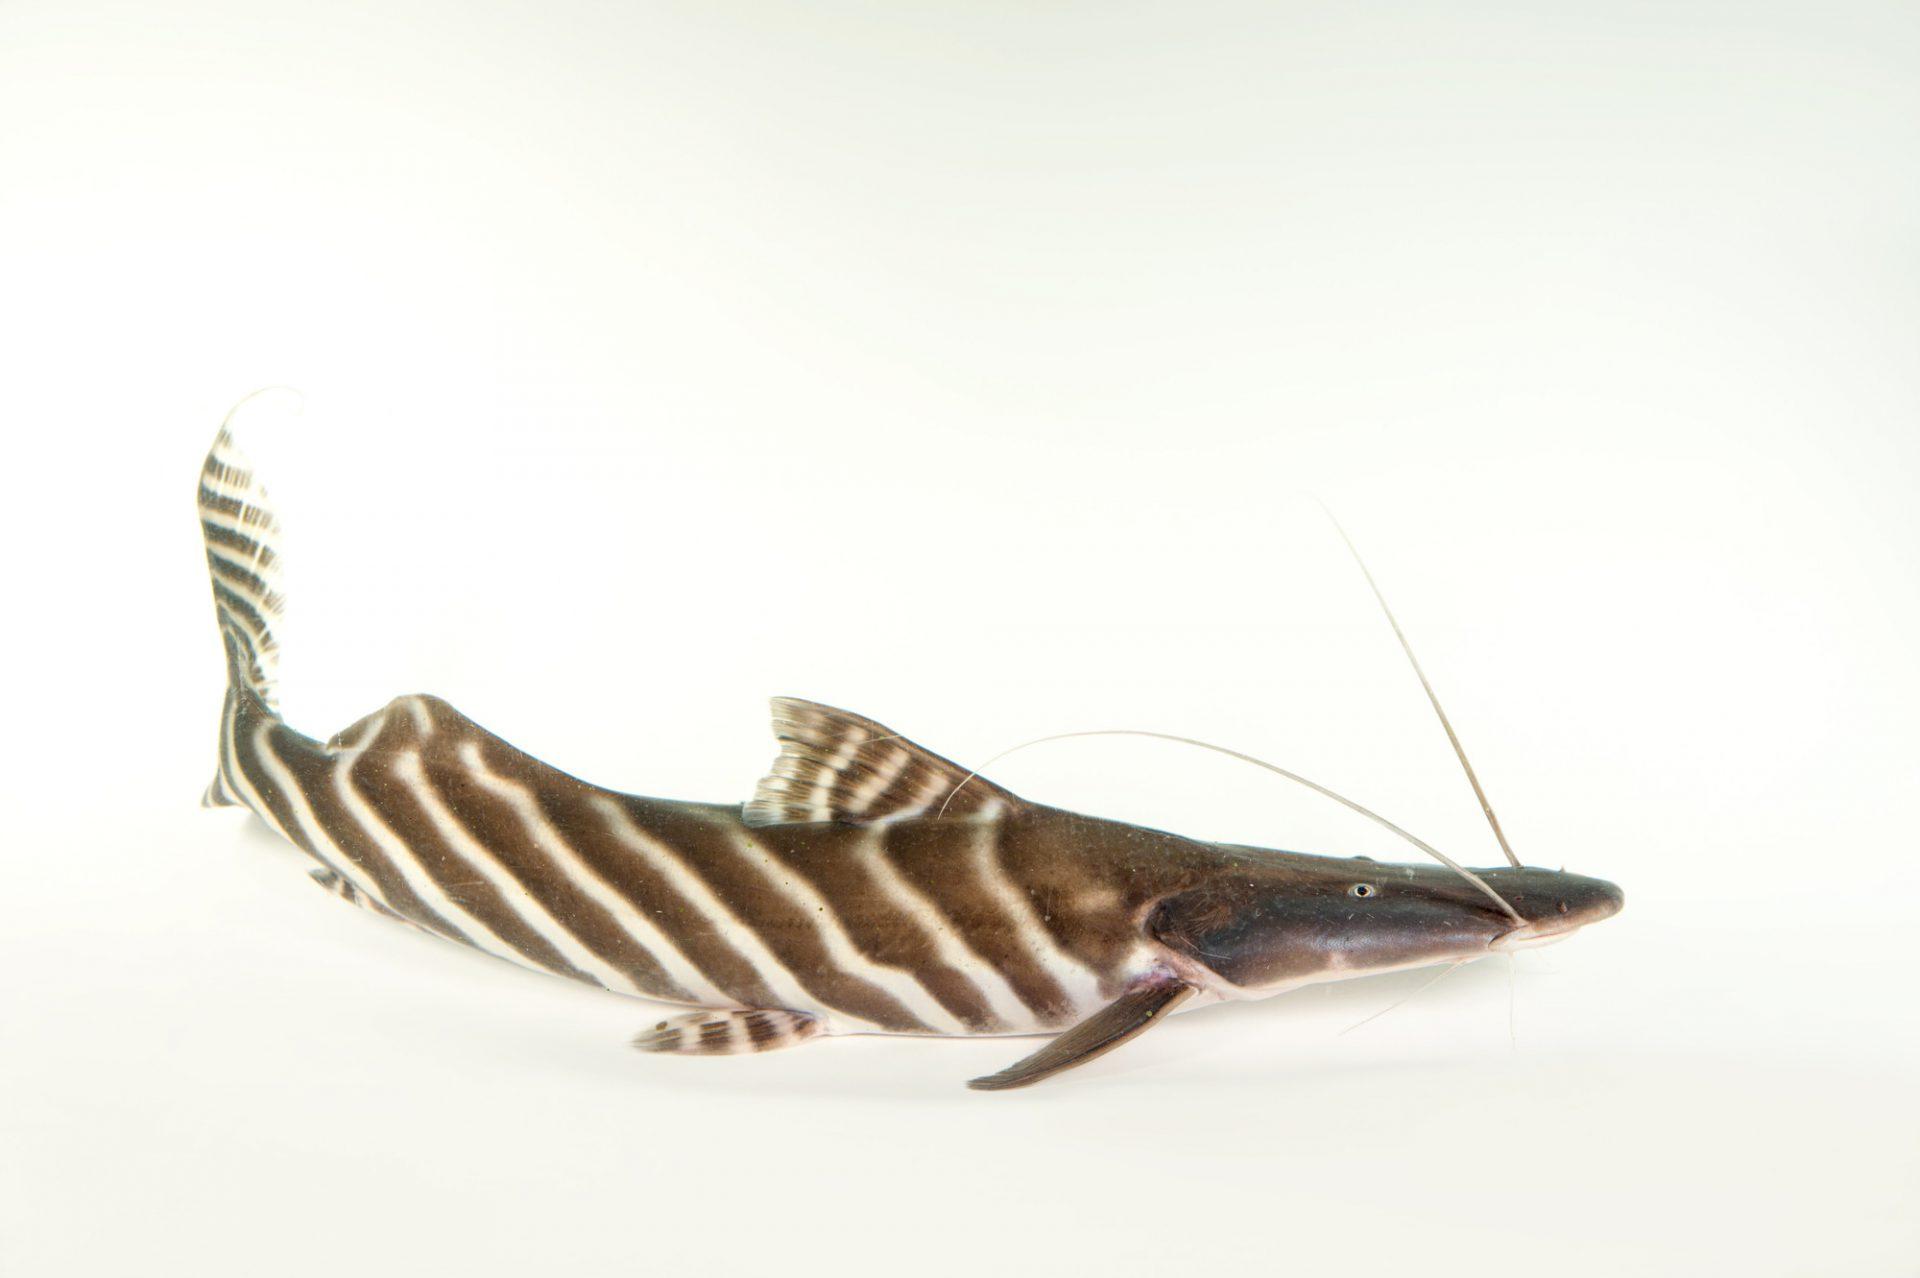 A tiger-striped catfish (Brachyplatystoma tigrinum) at the Dallas World Aquarium.